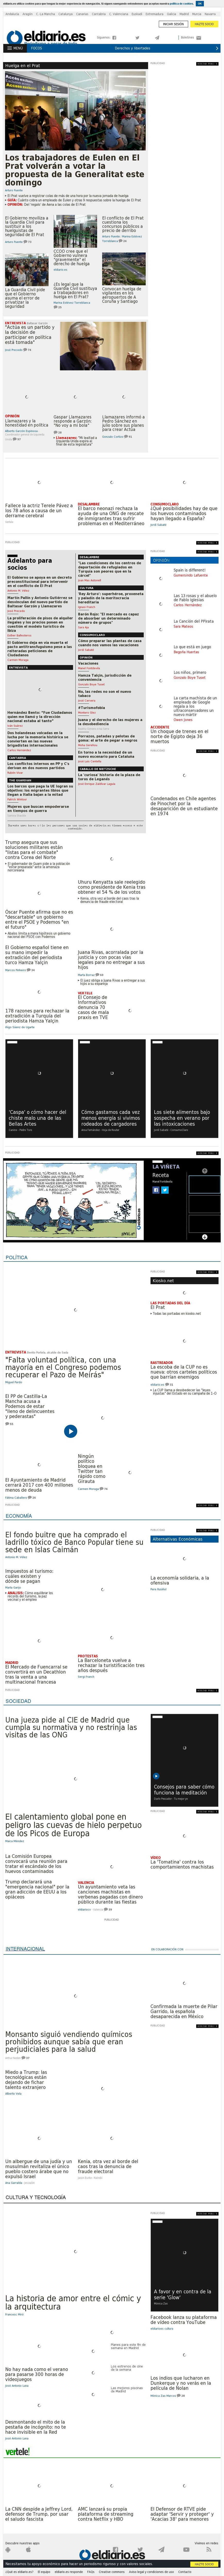 El Diario at Saturday Aug. 12, 2017, 1:04 a.m. UTC